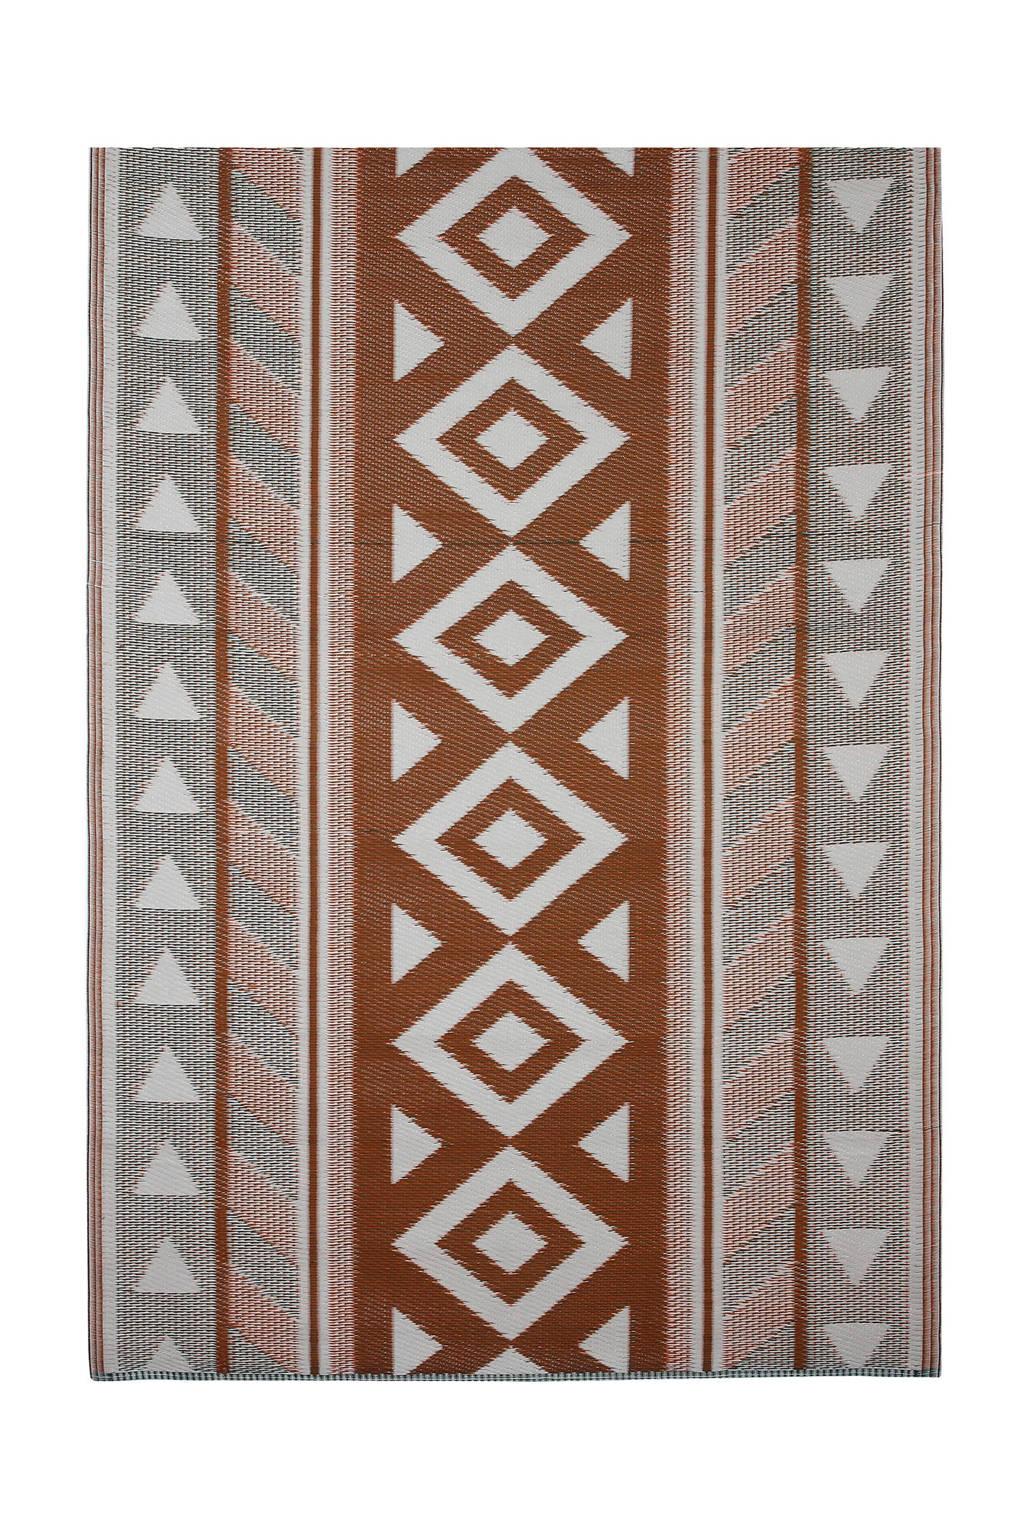 Mica Decorations vloerkleed (180x120 cm), Roodbruin